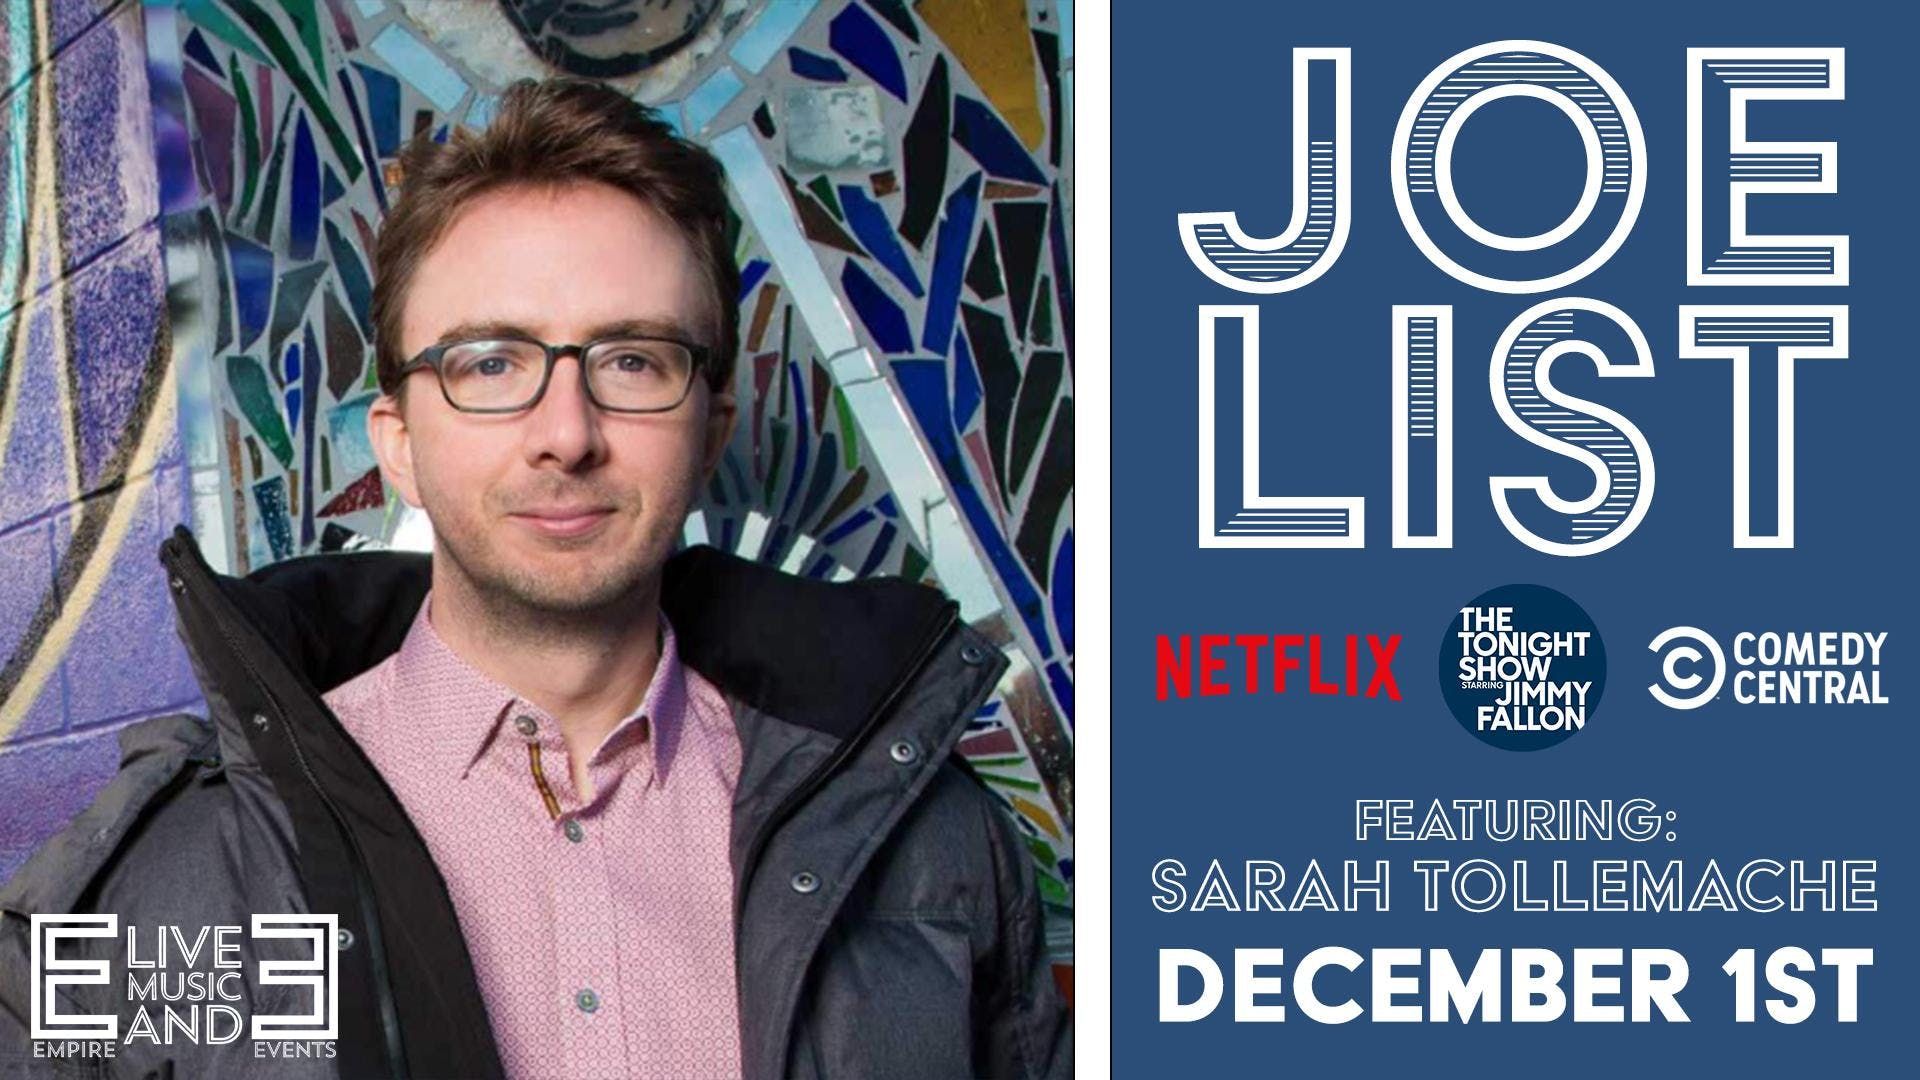 Joe List feat: Sarah Tollemache | Sunday Night Comedy